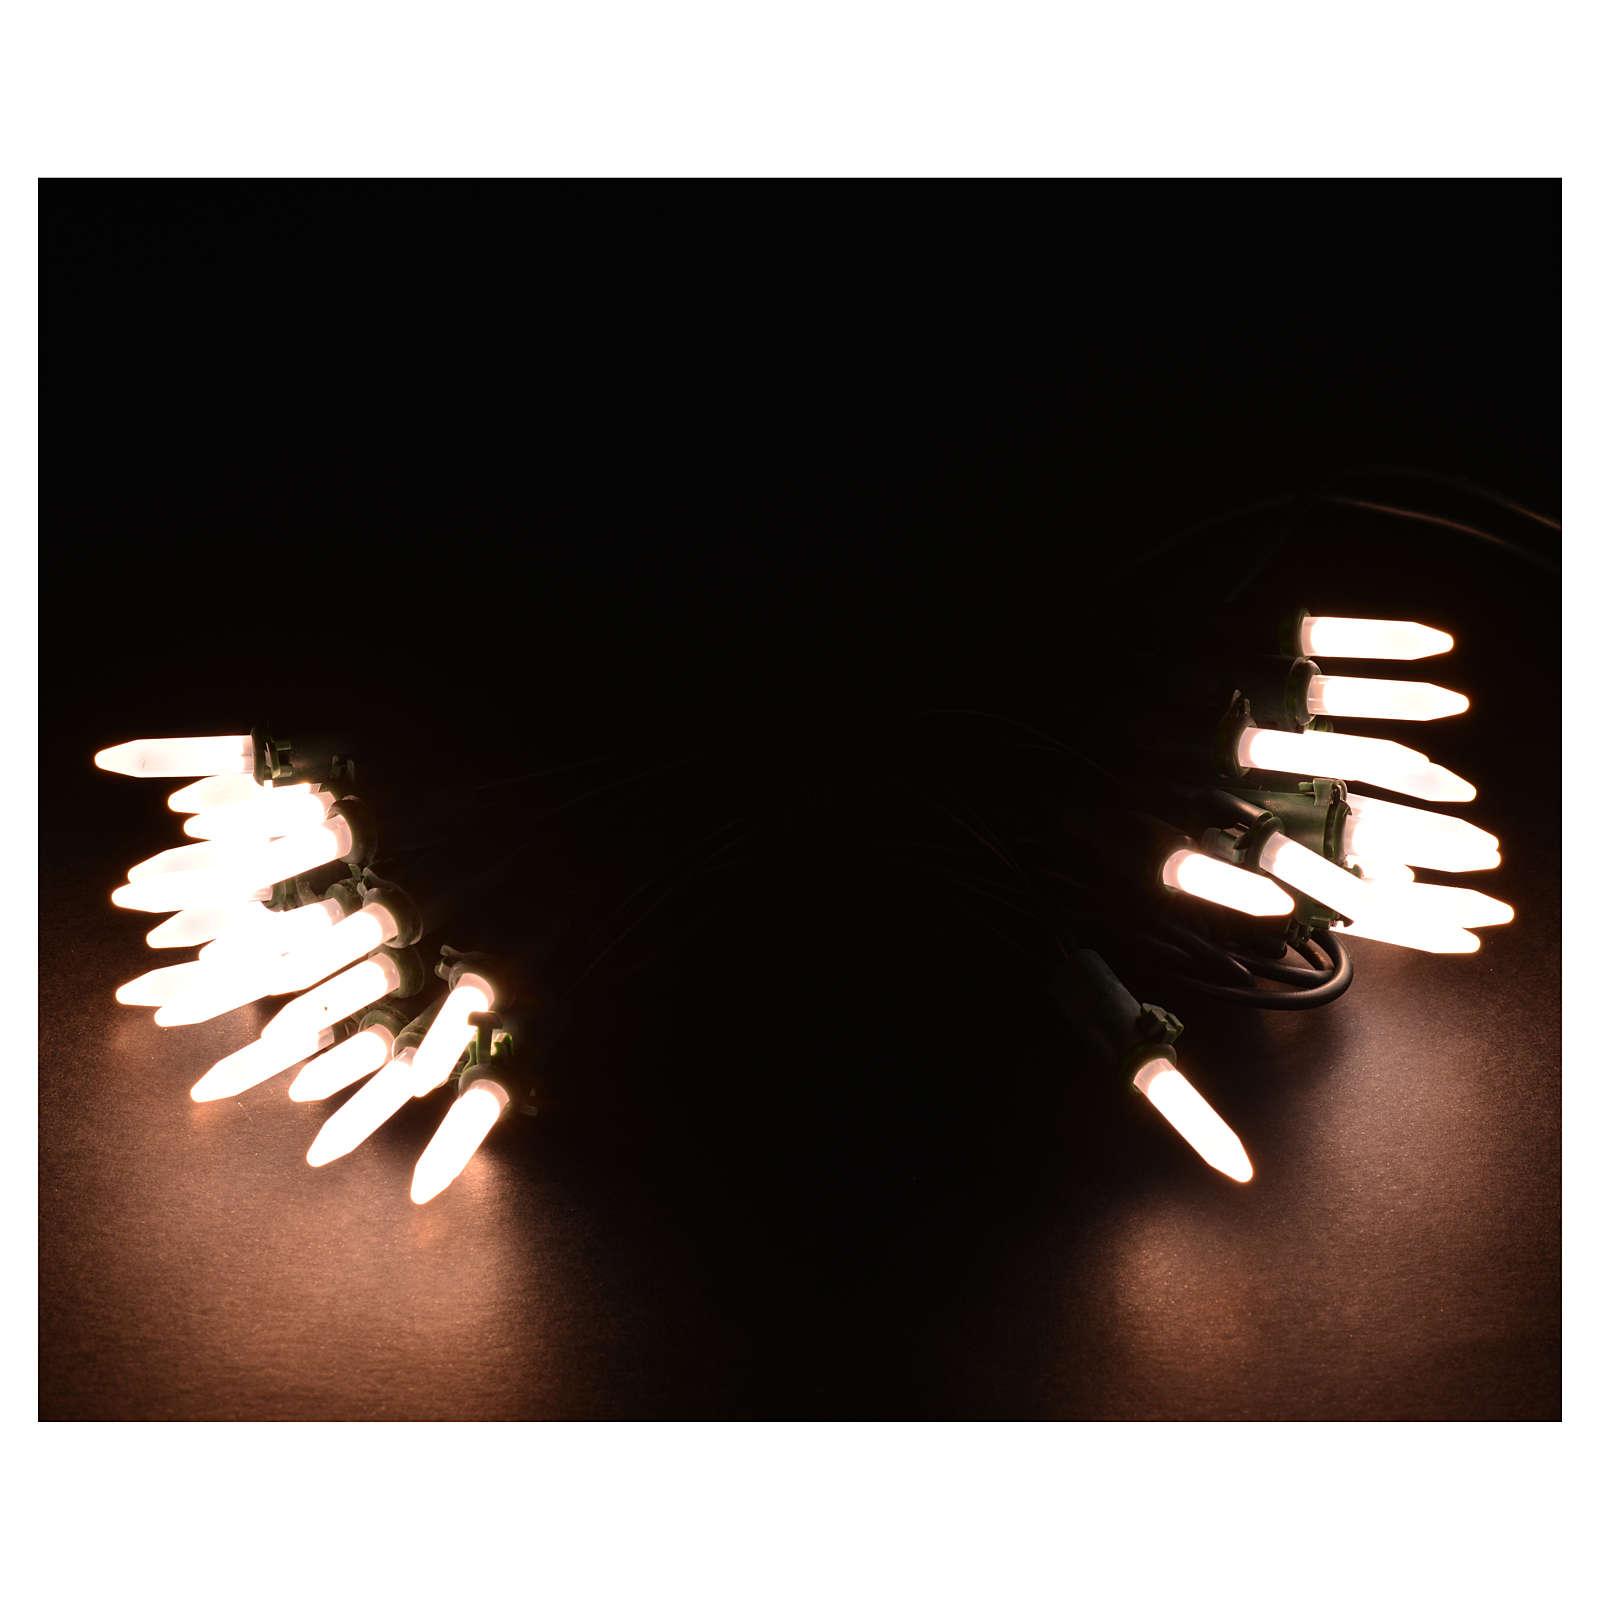 Luces de Navidad 35 LED blanco cálido tipo Arroz para interior 3